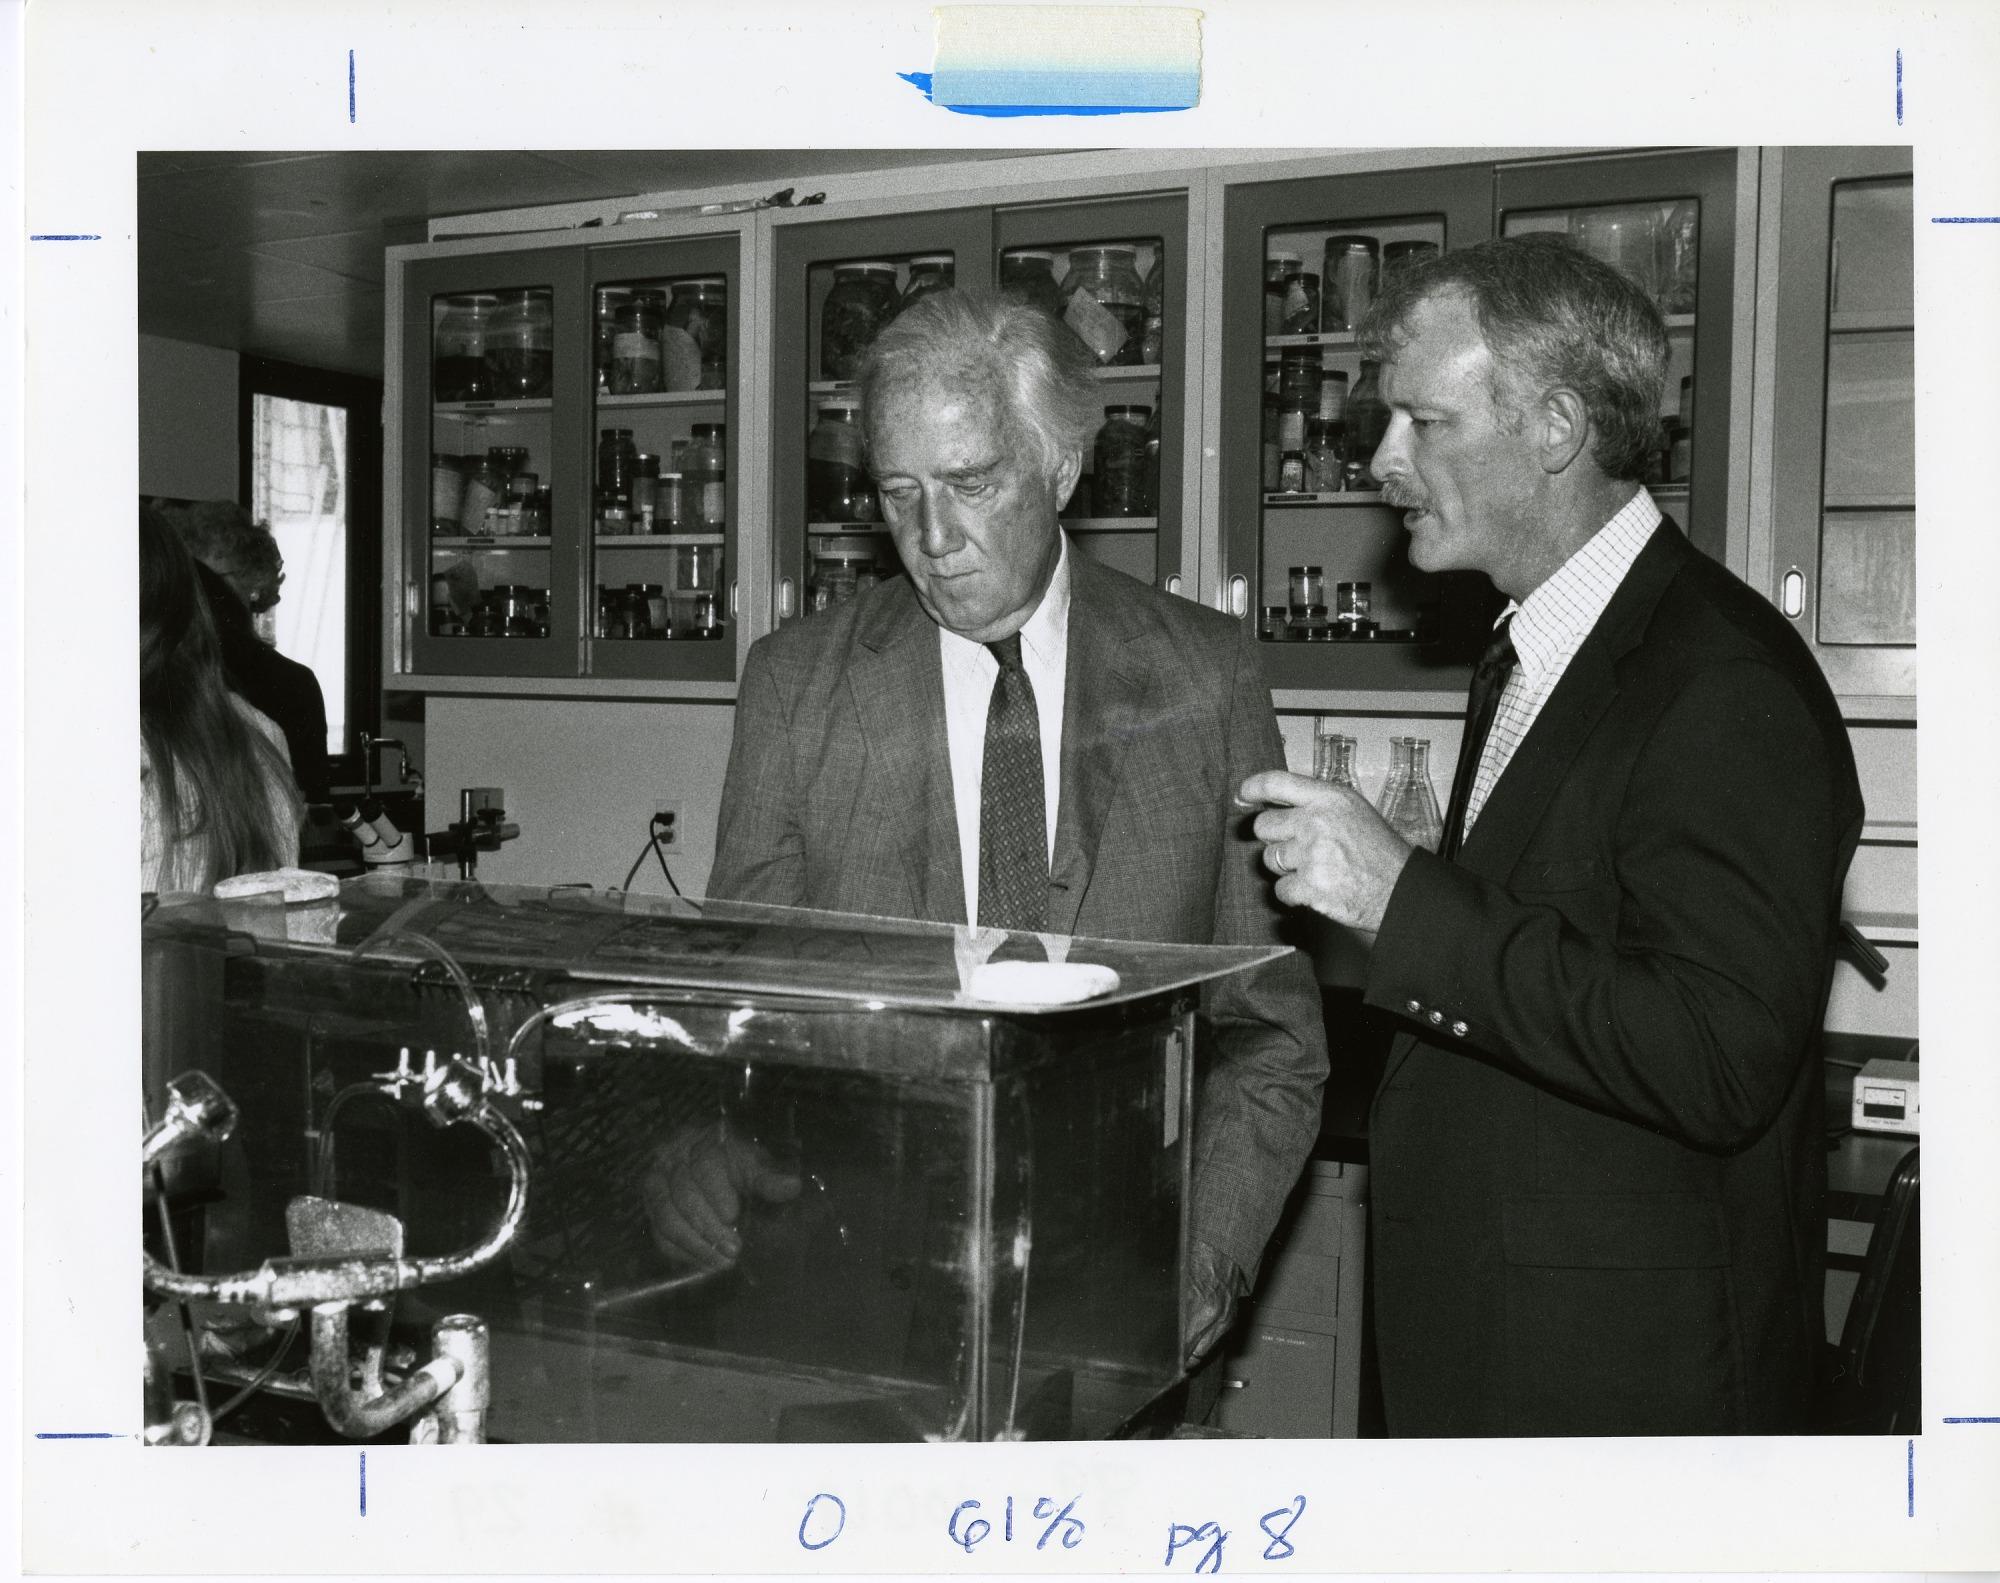 SERC Scientist Tuck Hines and Senator Mathias